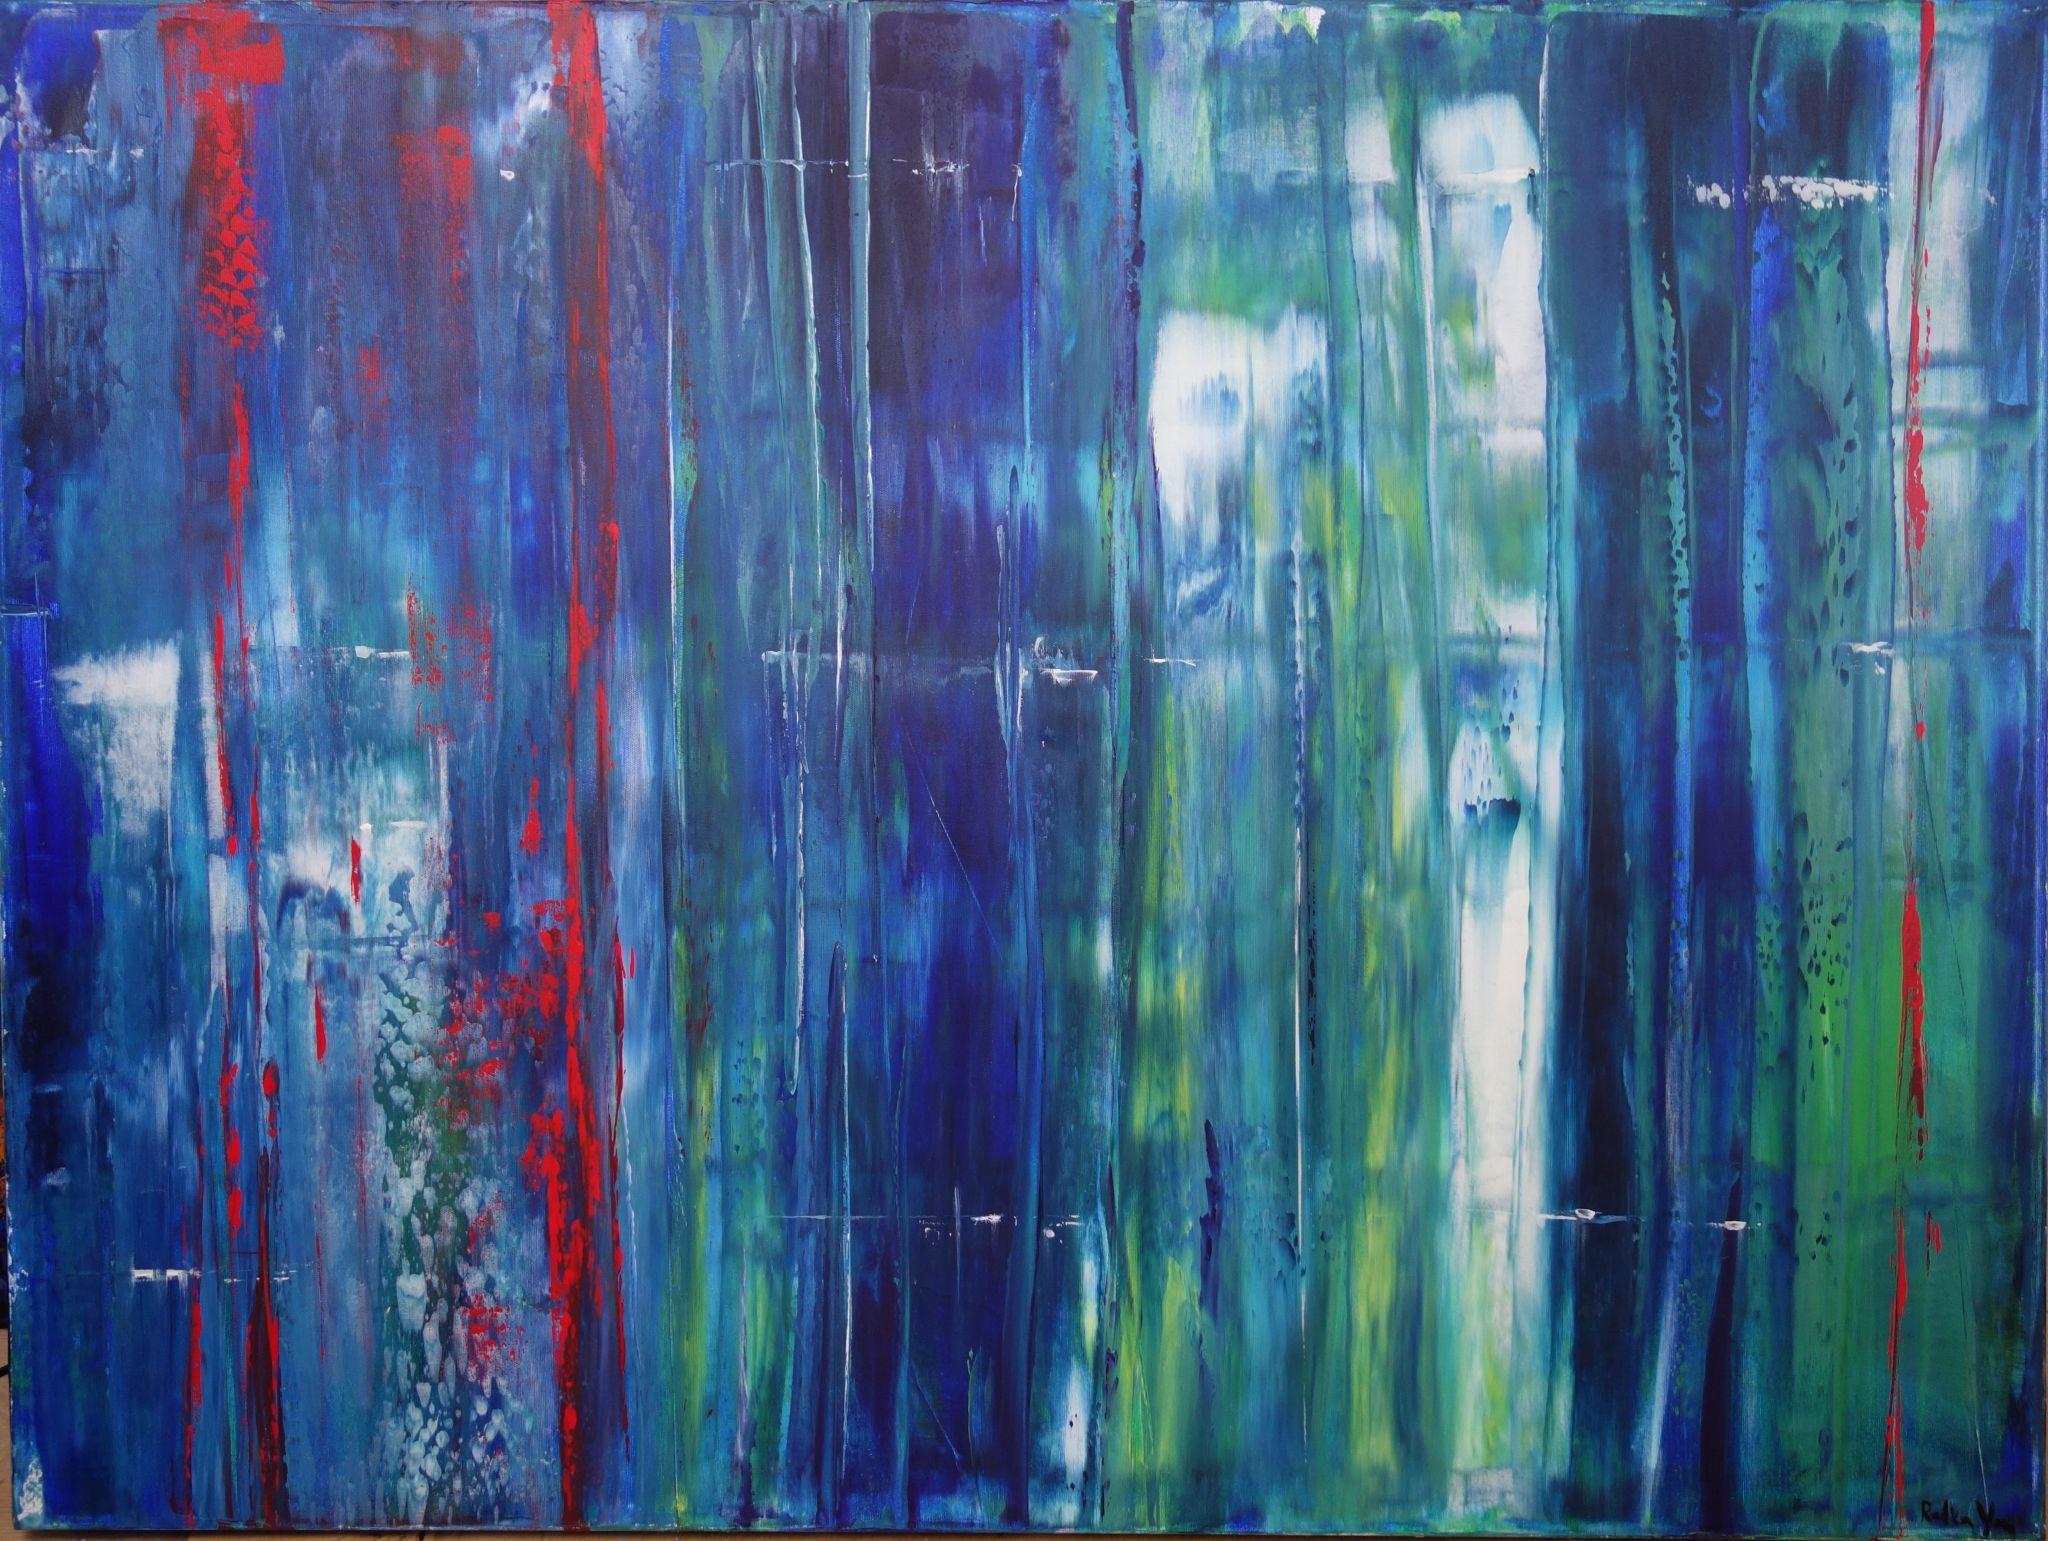 za oponou, 100/120 cm, 2016, akryl na plátně